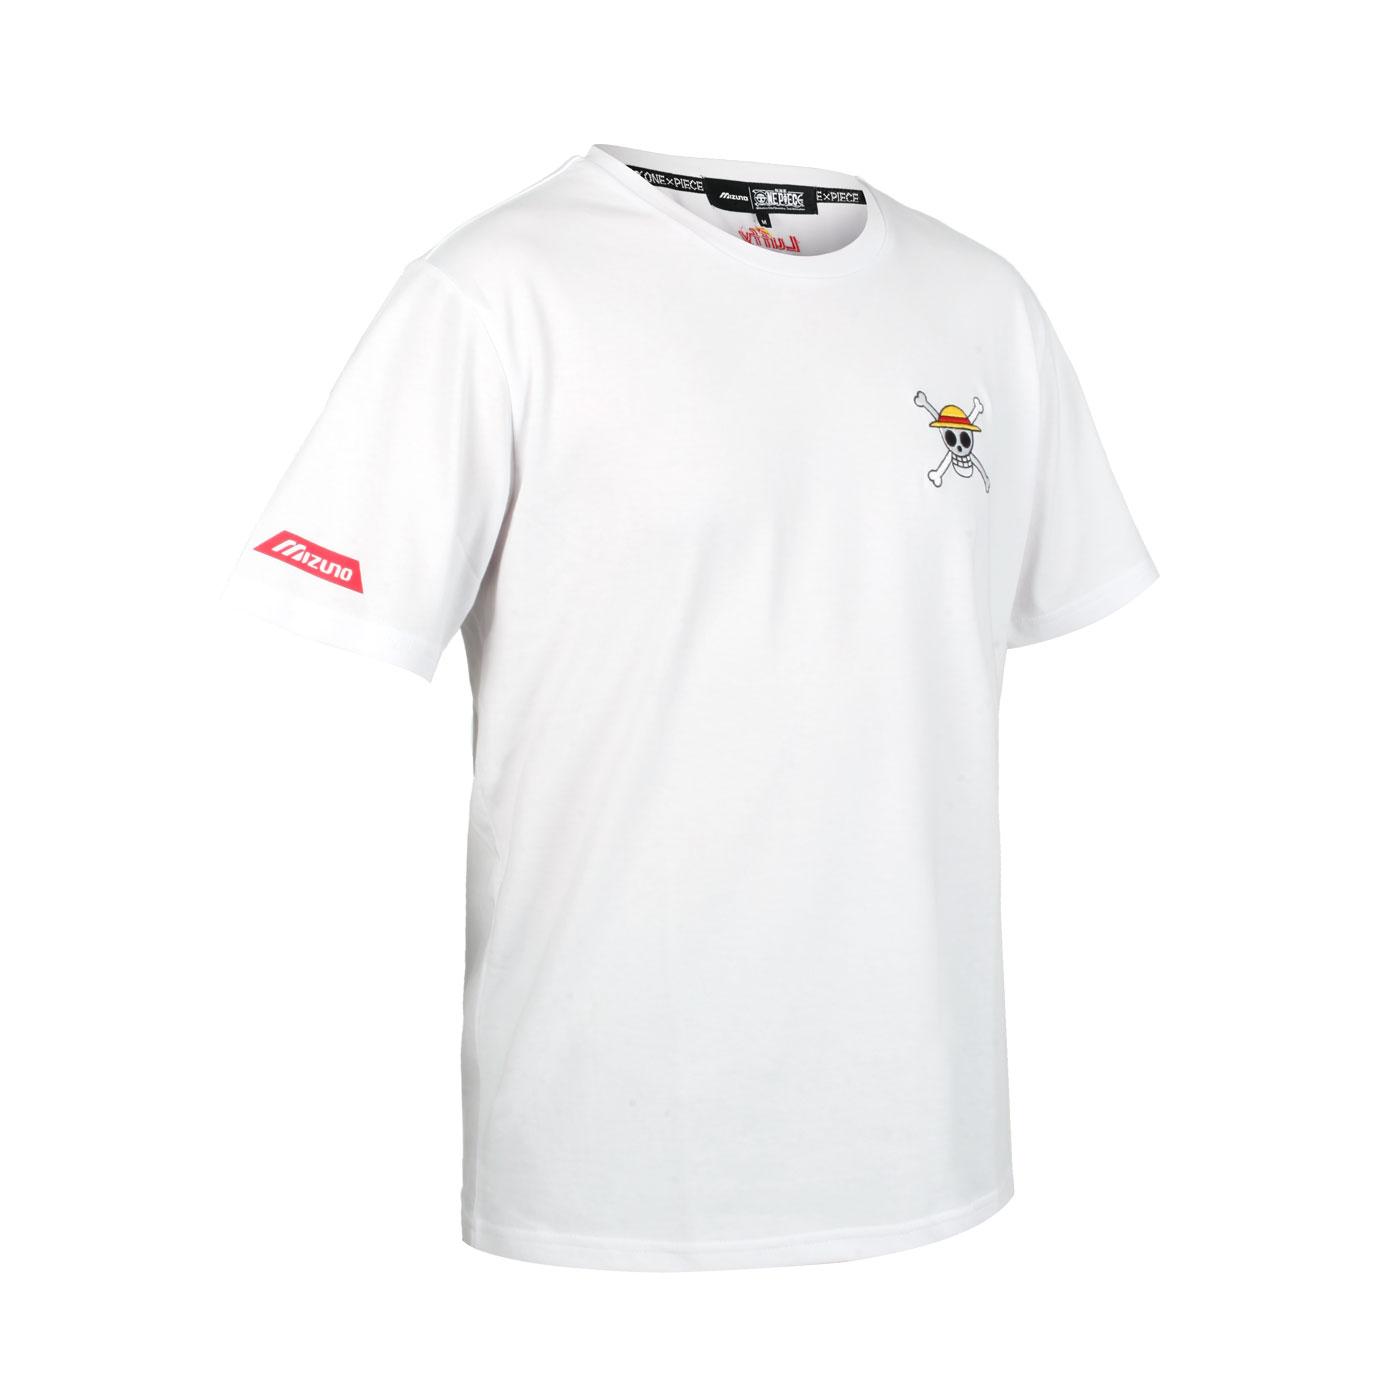 MIZUNO 特定-男款短袖T恤-魯夫款(海賊王聯名款) D2TA150901